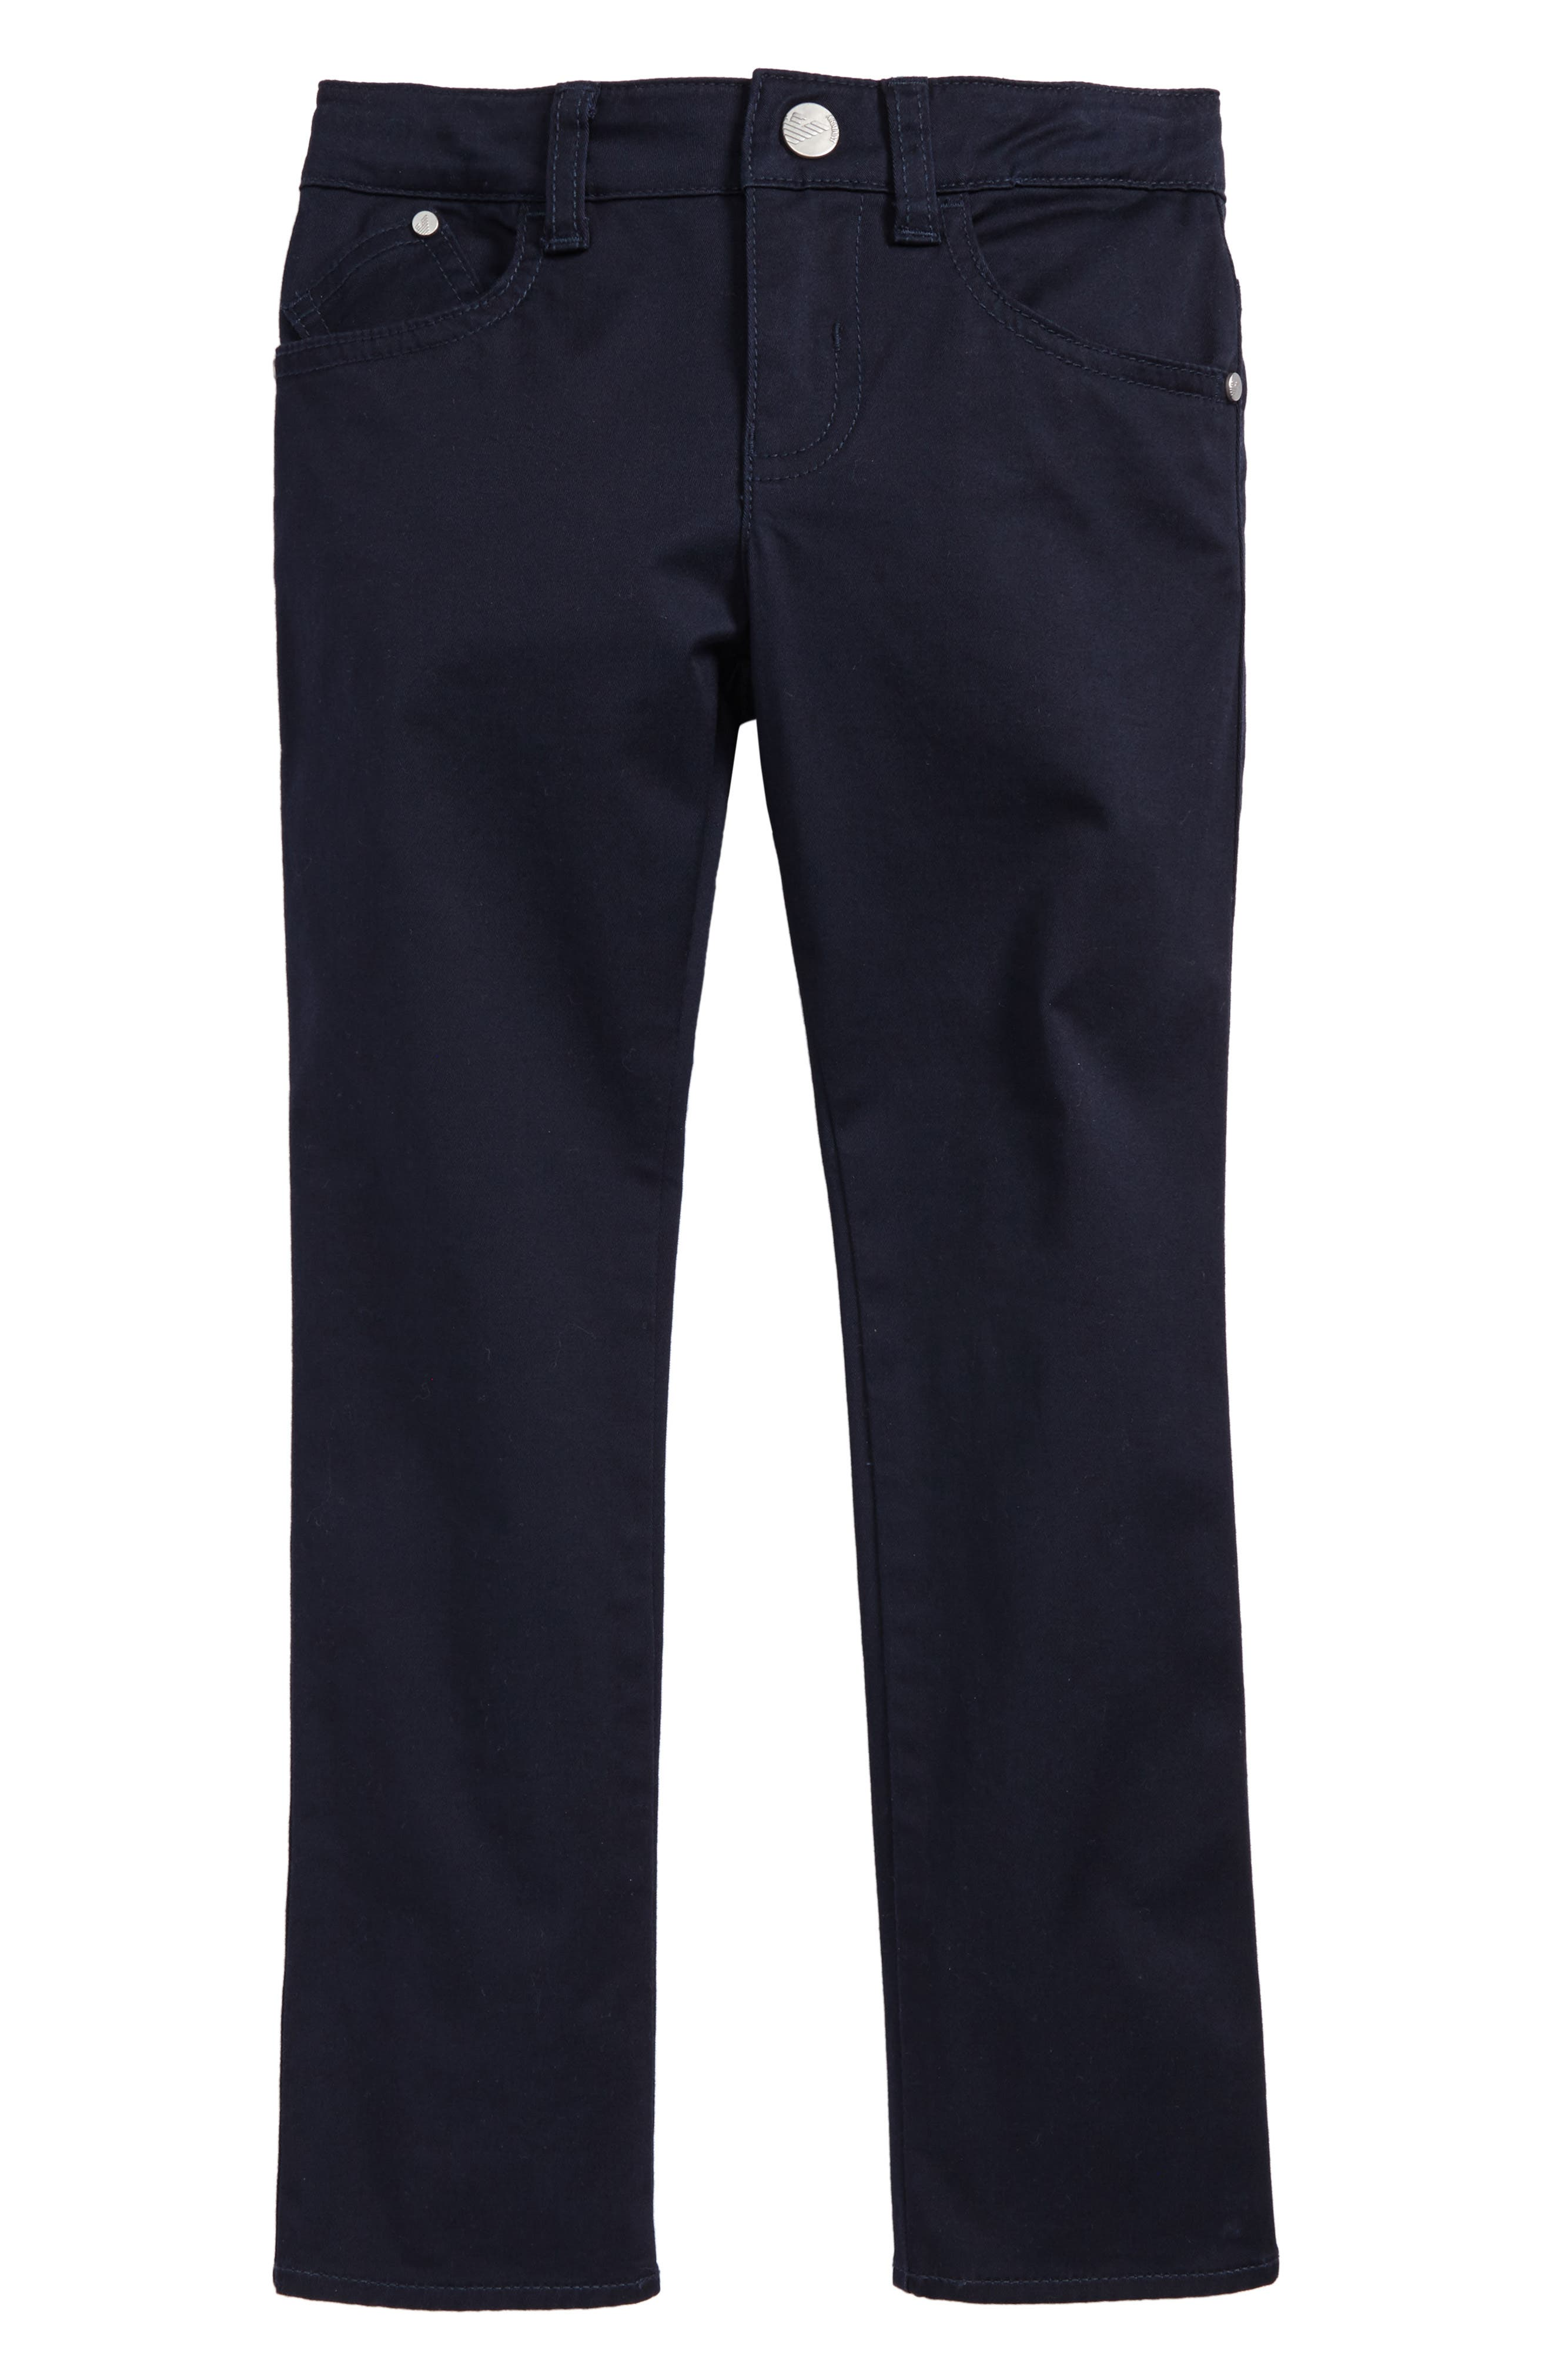 Armani Junior Stretch Cotton Twill Pants (Little Boys & Big Boys)